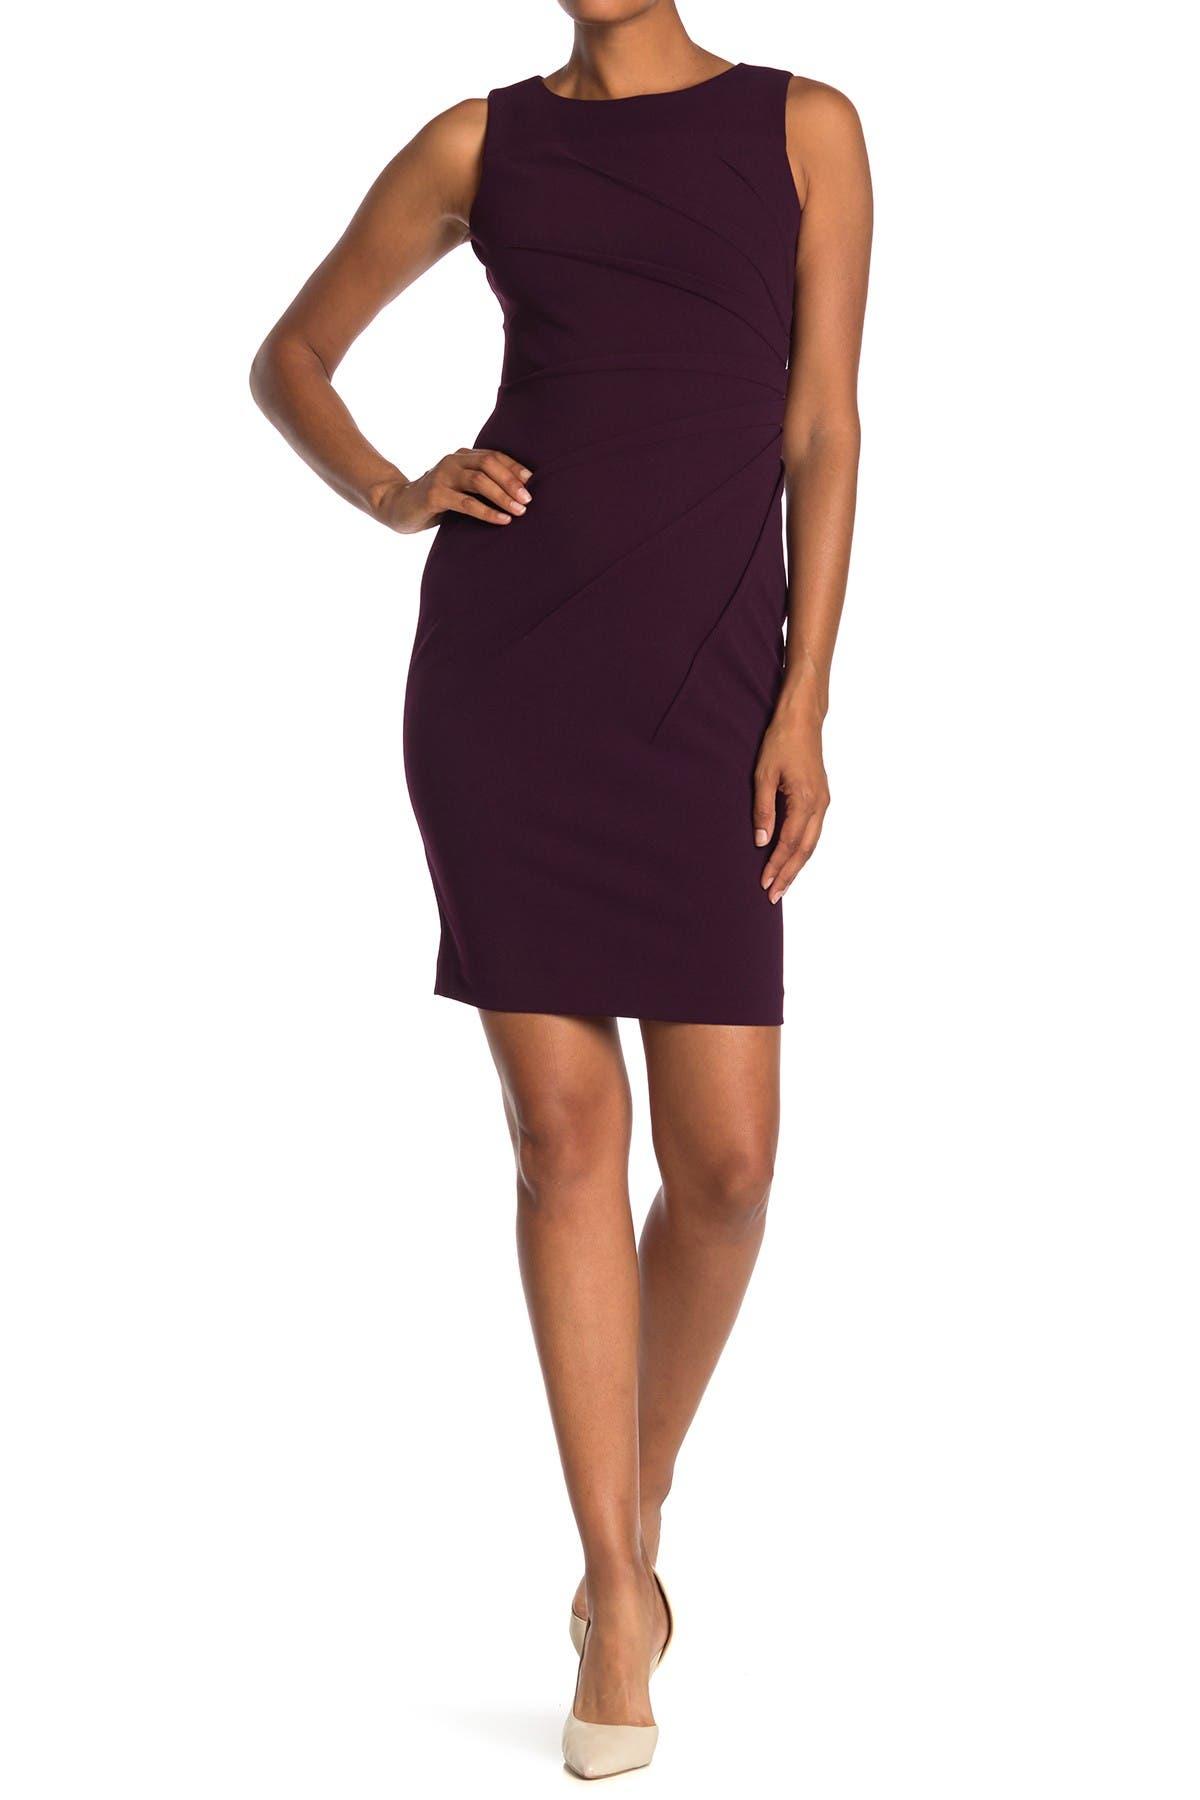 Image of Calvin Klein Sleeveless Starburst Stitch Sheath Dress